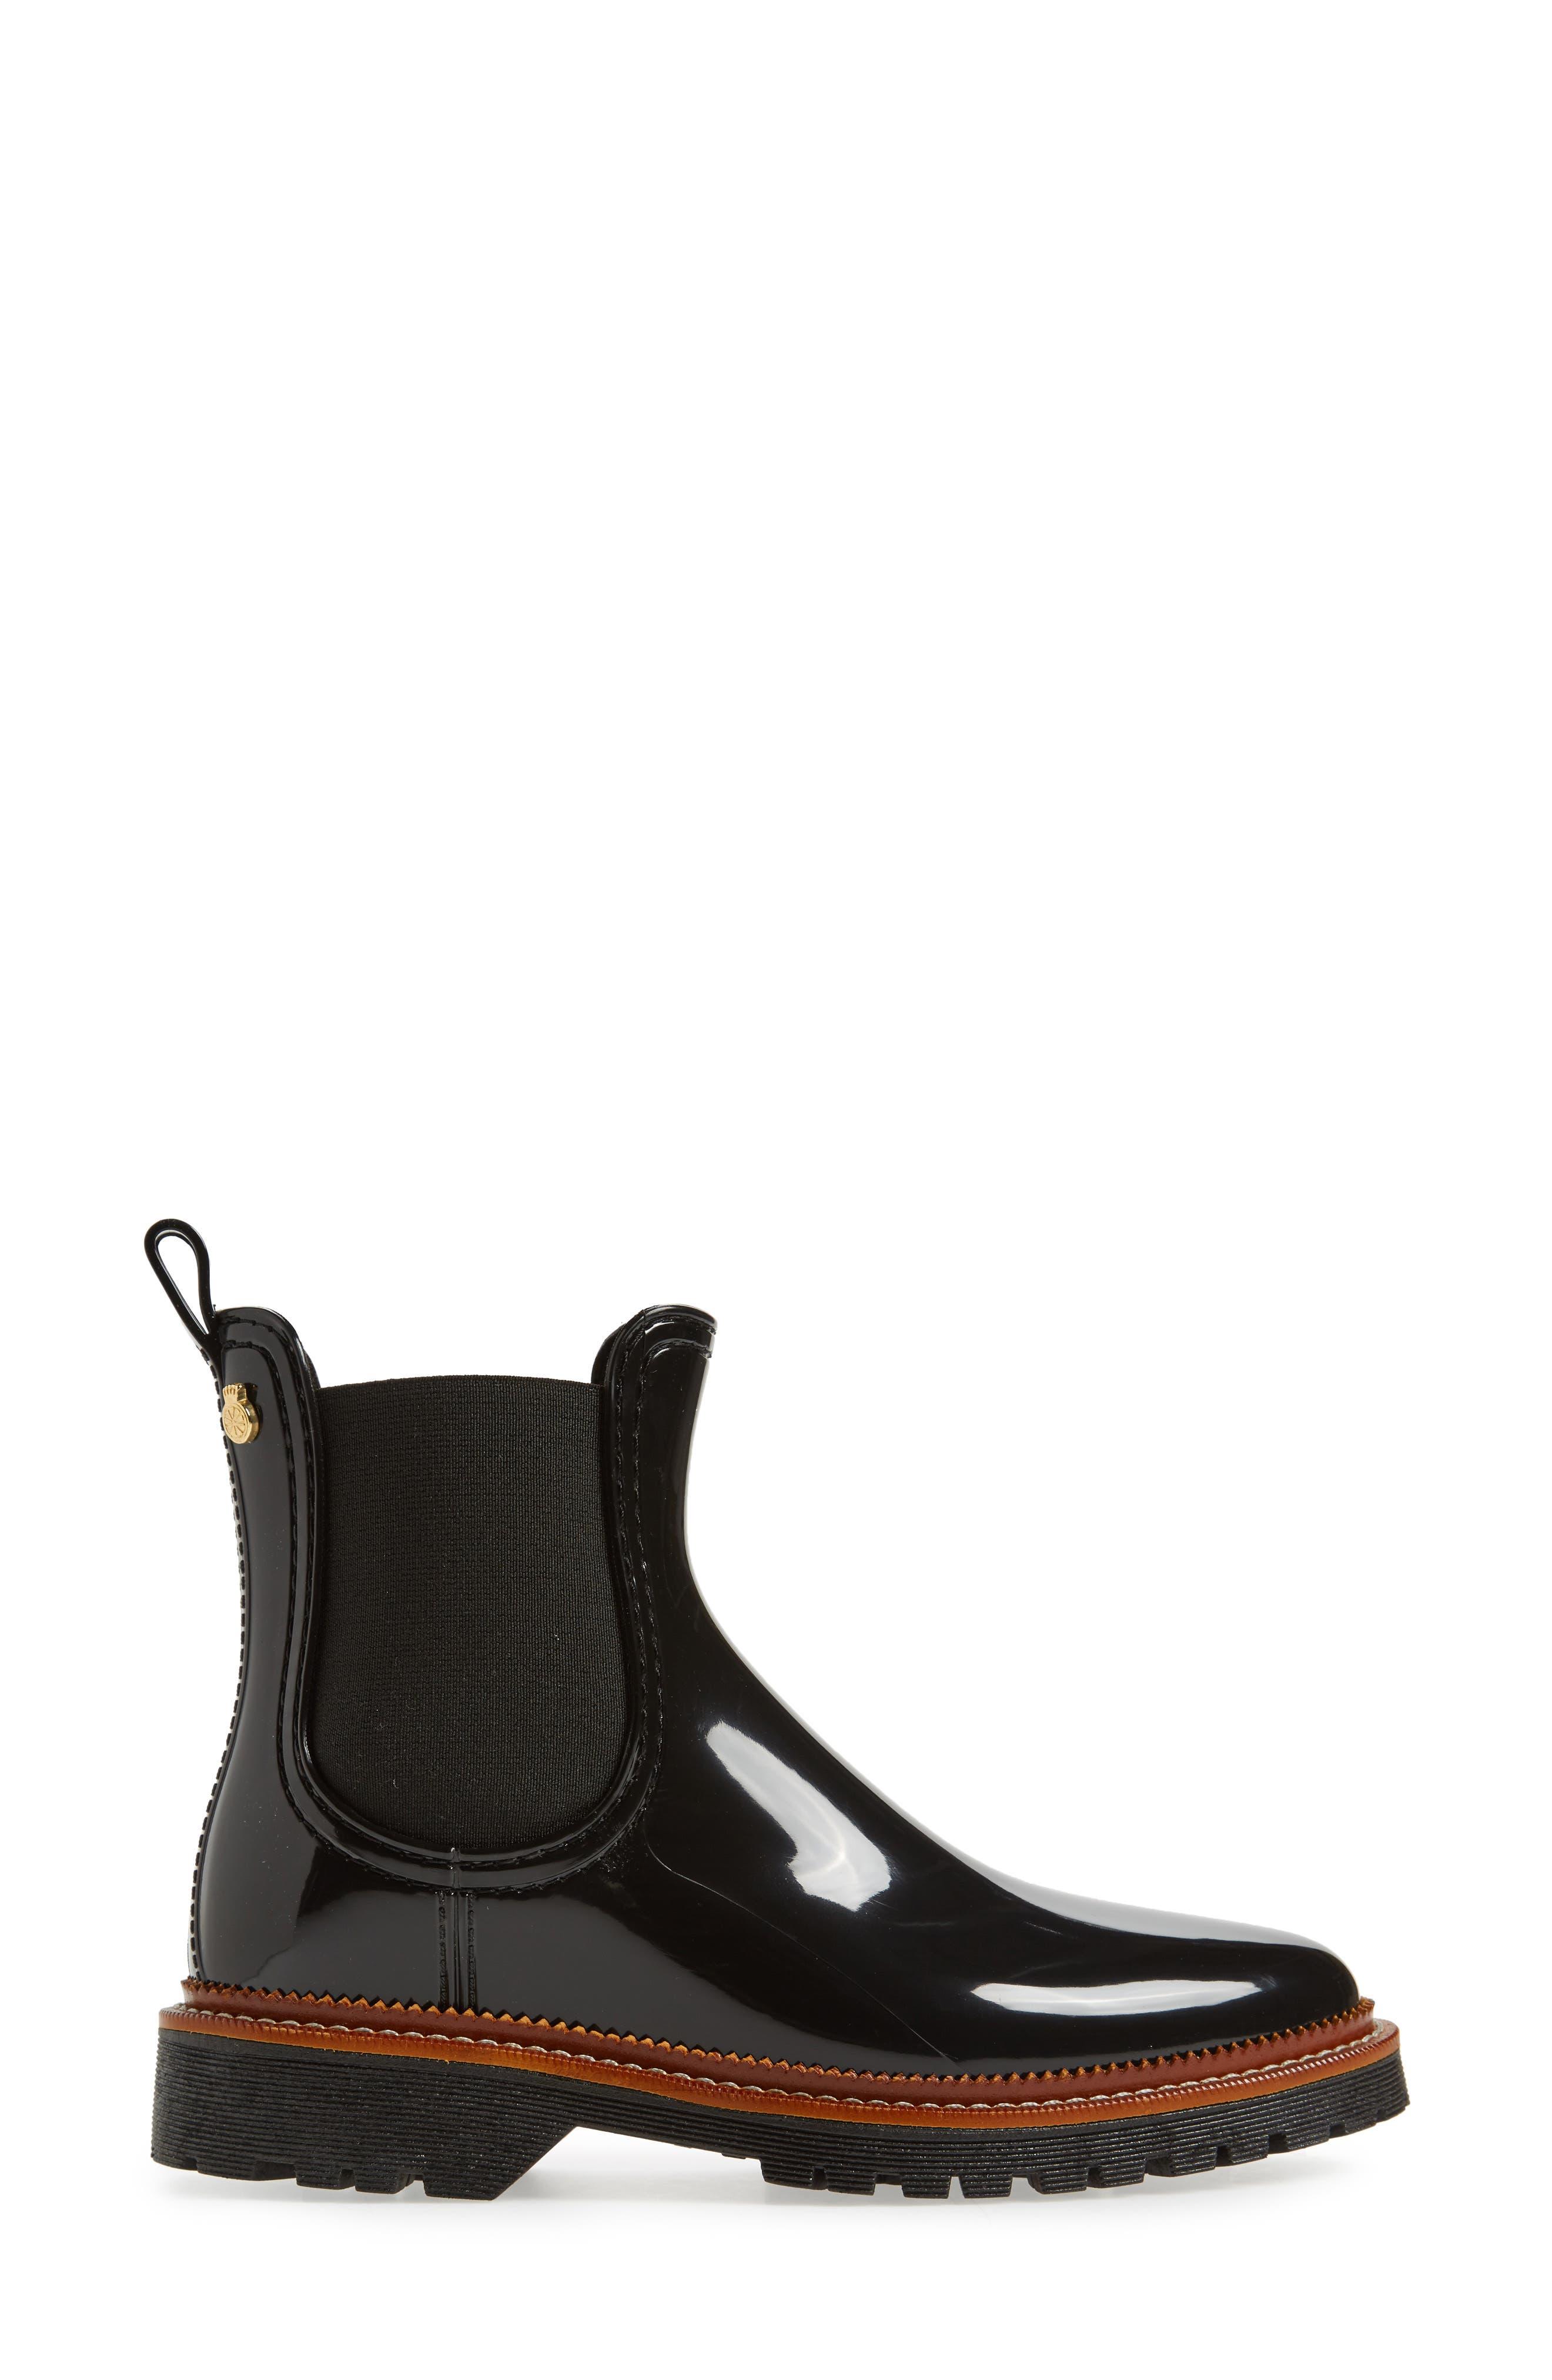 April Waterproof Chelsea Boot,                             Alternate thumbnail 3, color,                             Black Gloss